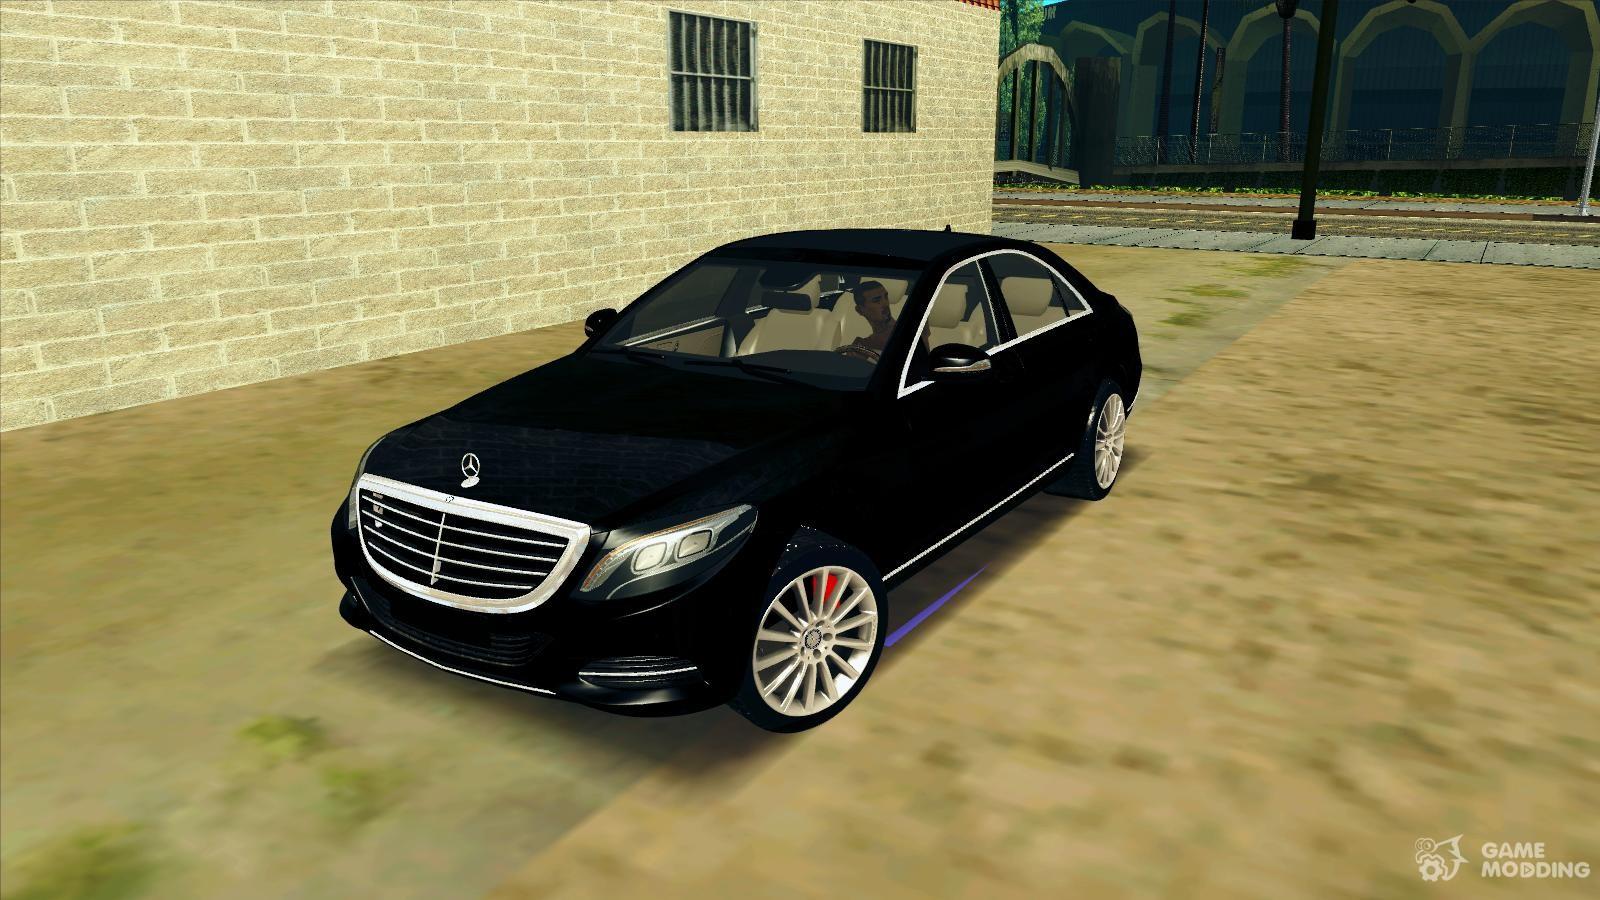 MercedesBenz для GTA San Andreas  GTAViceCityRU